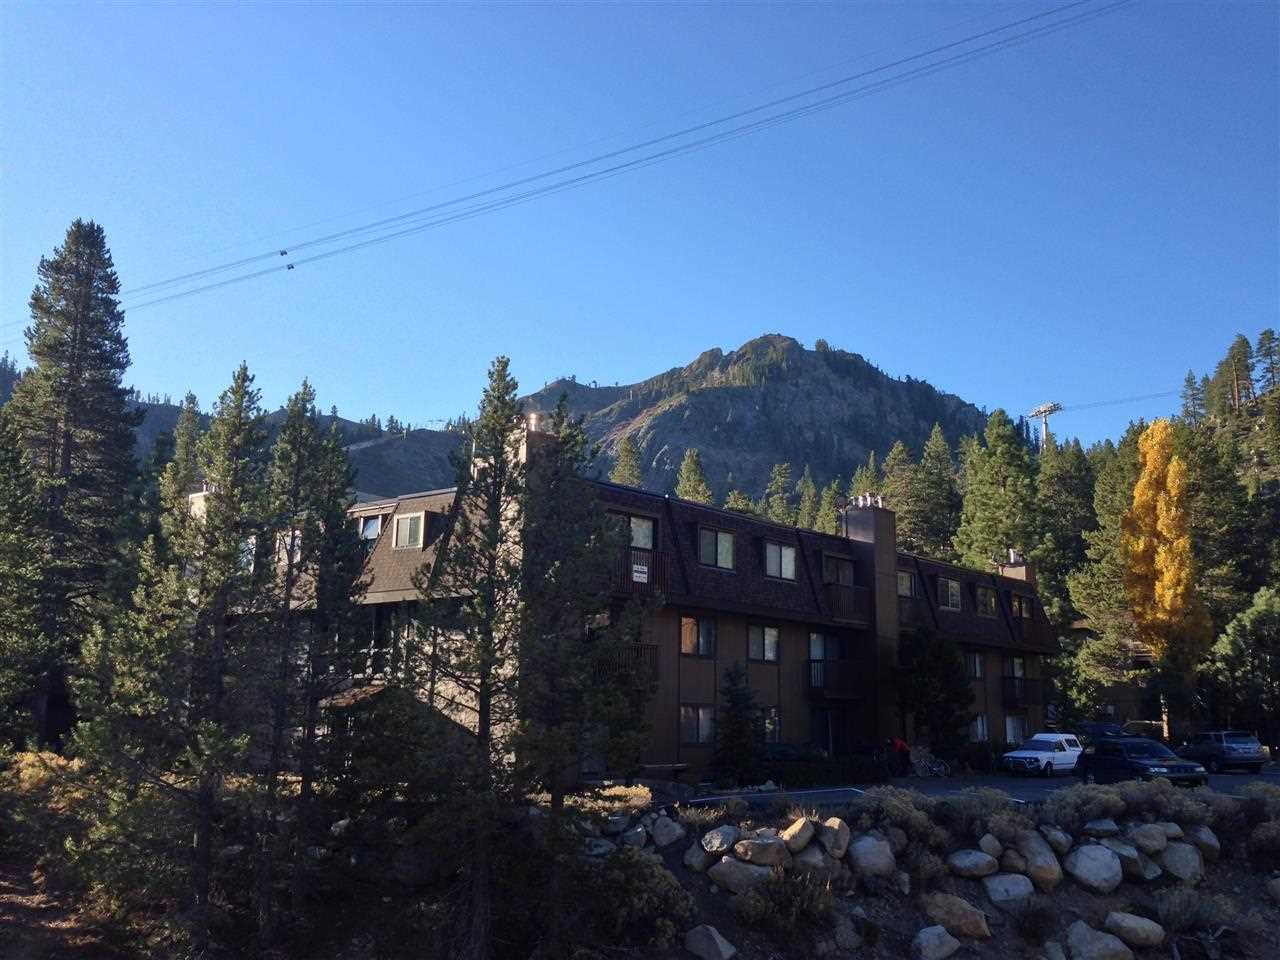 Additional photo for property listing at 420 Squaw Peak Road  奥林匹克山, 加利福尼亚州 96146 美国